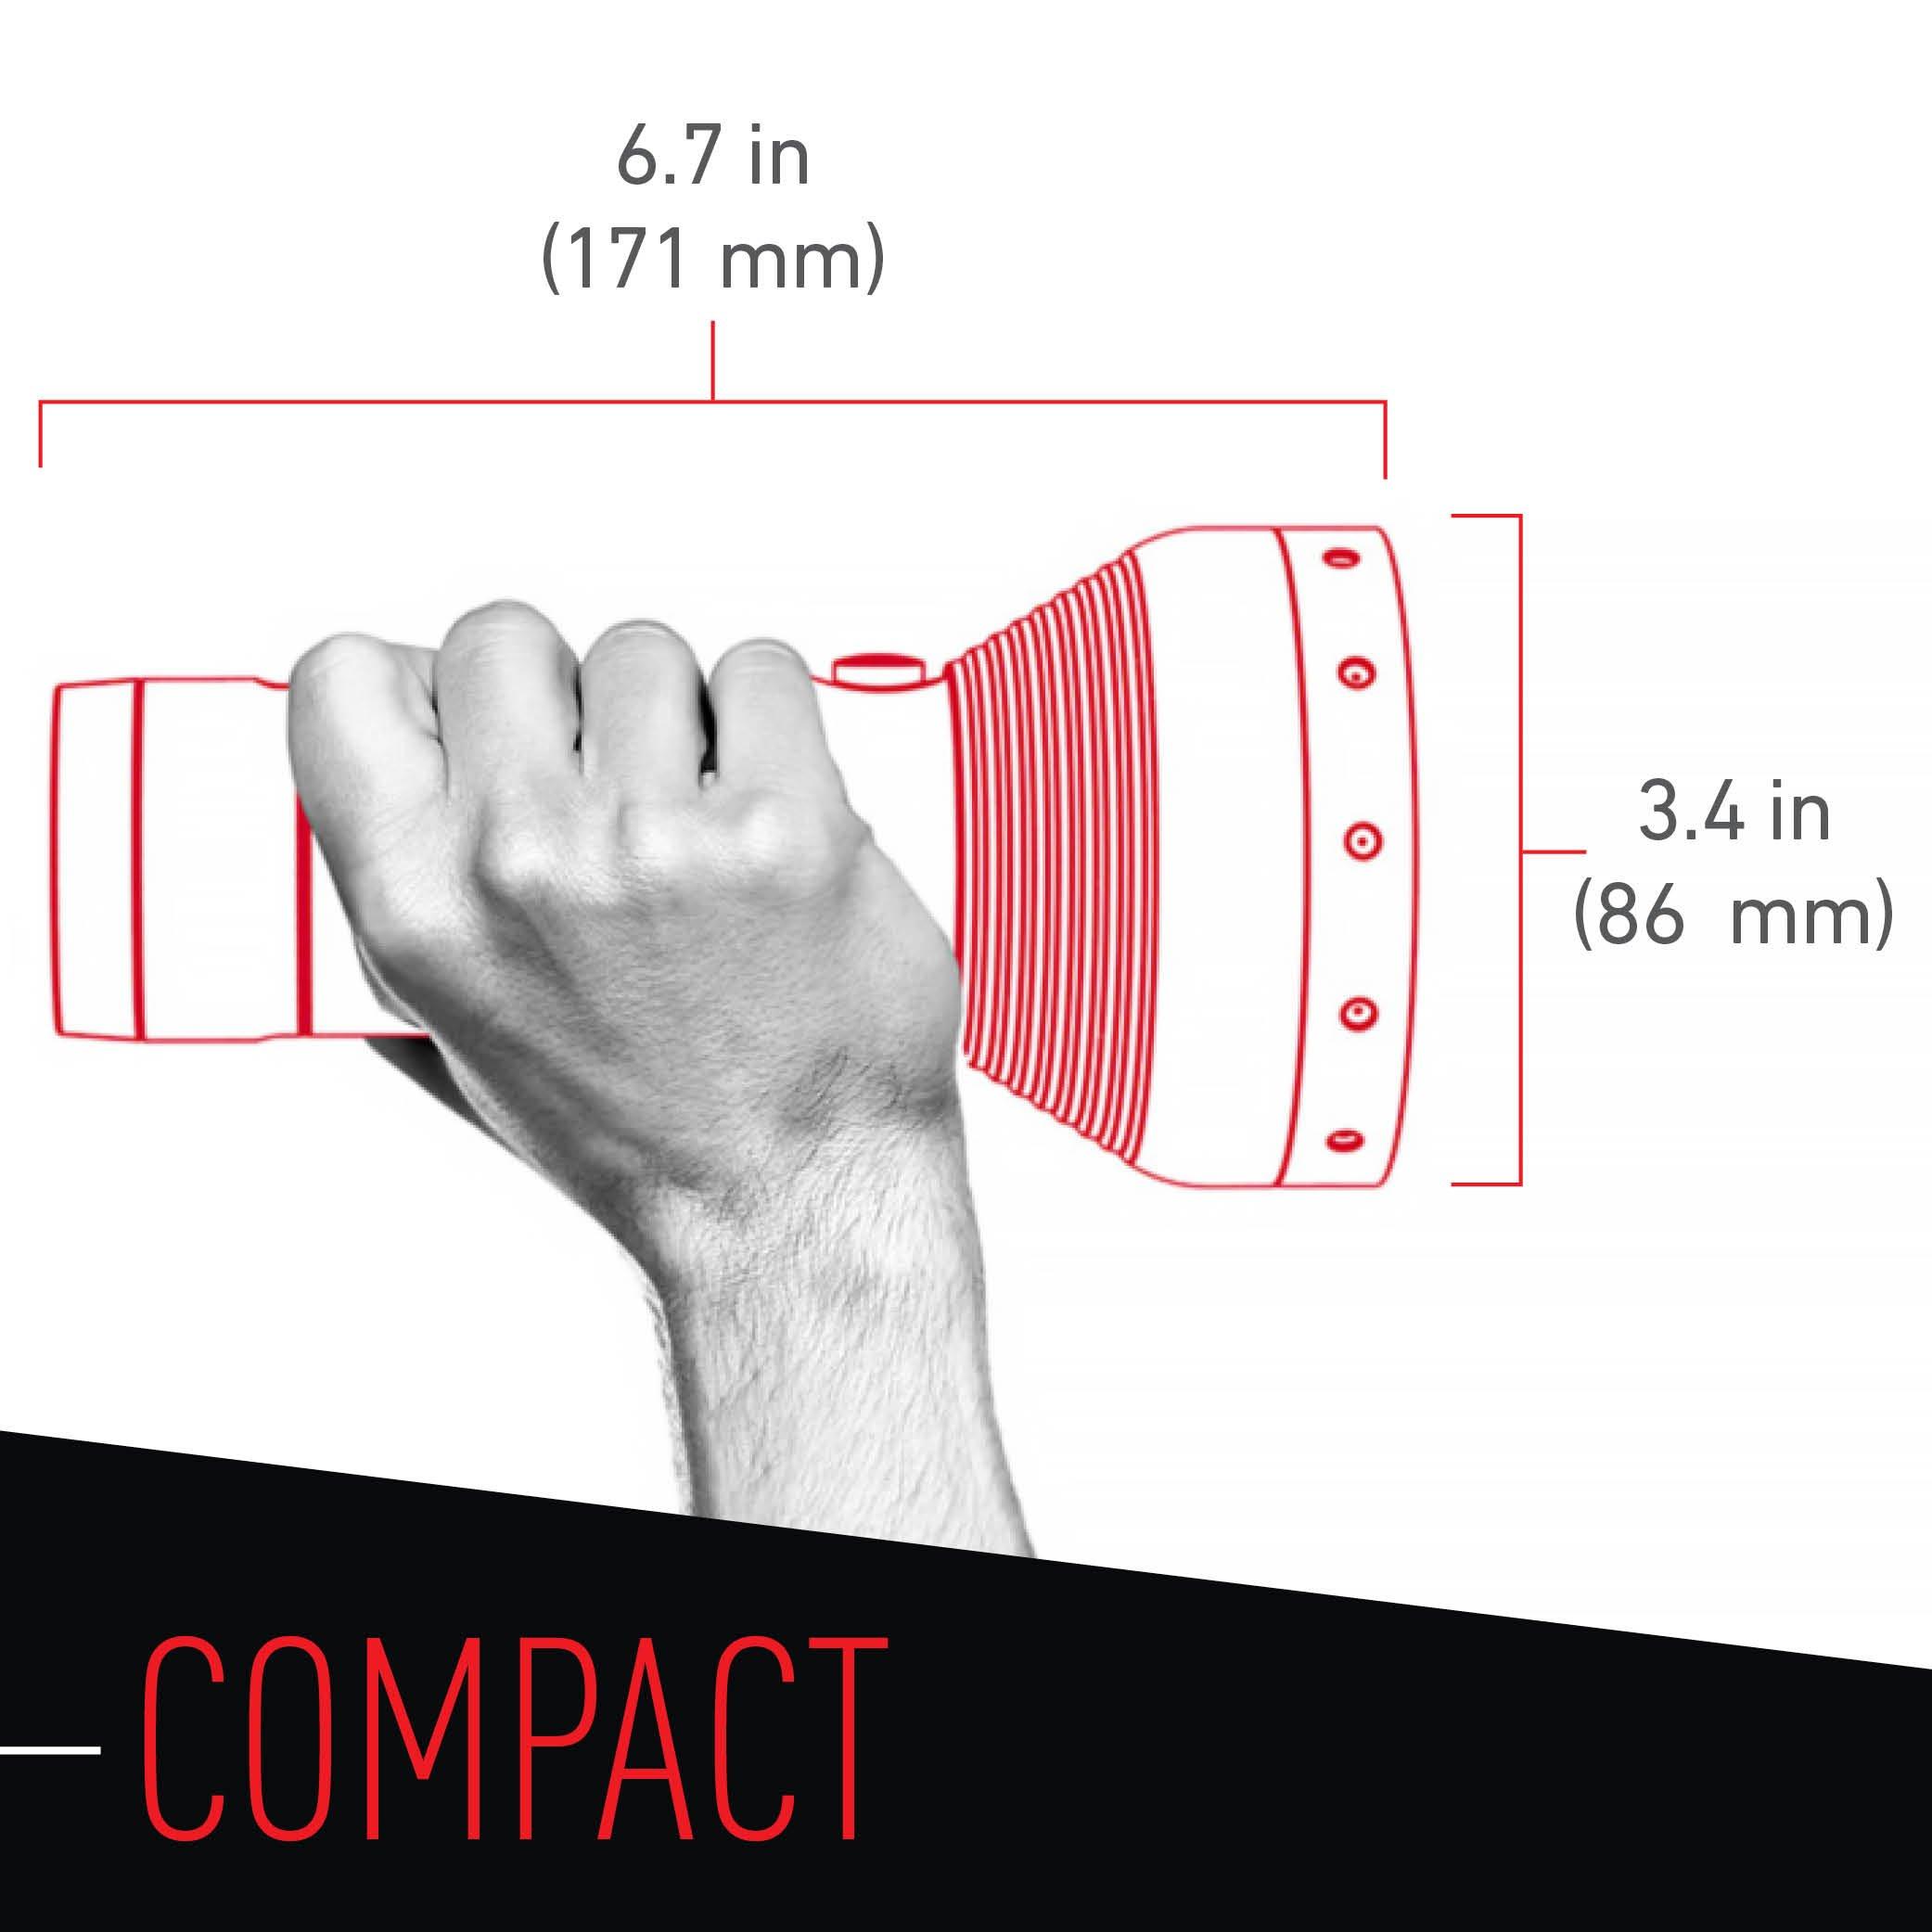 Led Lenser - 3000 Lumens, MT18 Flashlight with Rapid Focus System by LED Lenser (Image #6)